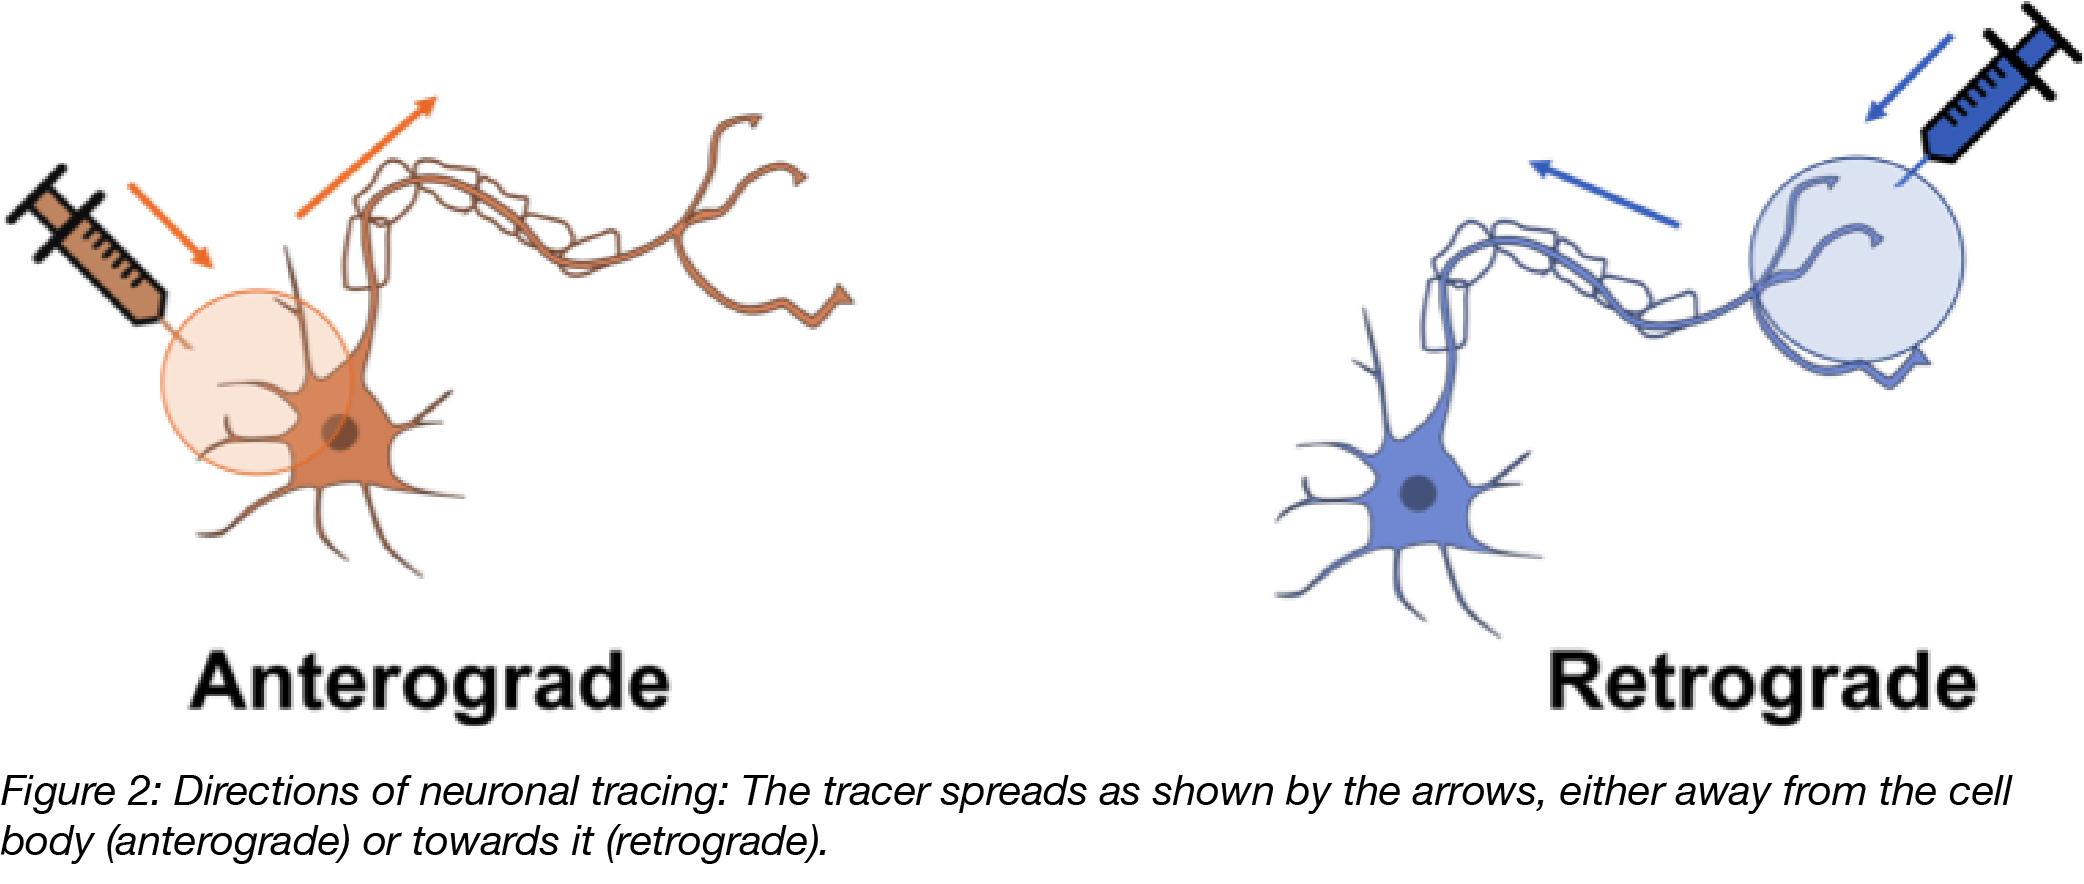 Anterograde and Retrograde Tracing